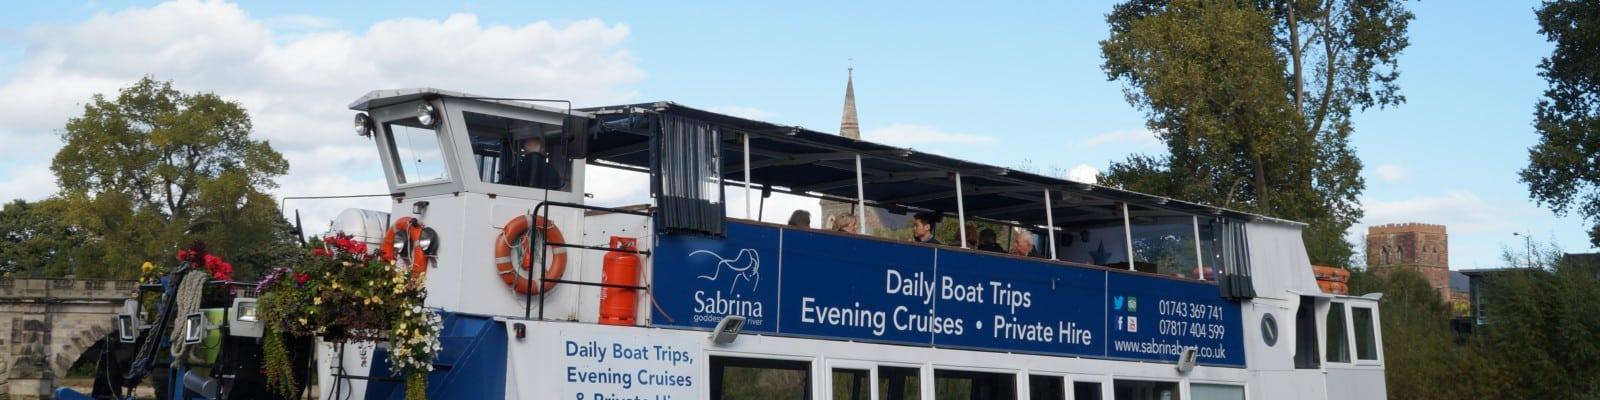 Sabrina Boat Day Trips